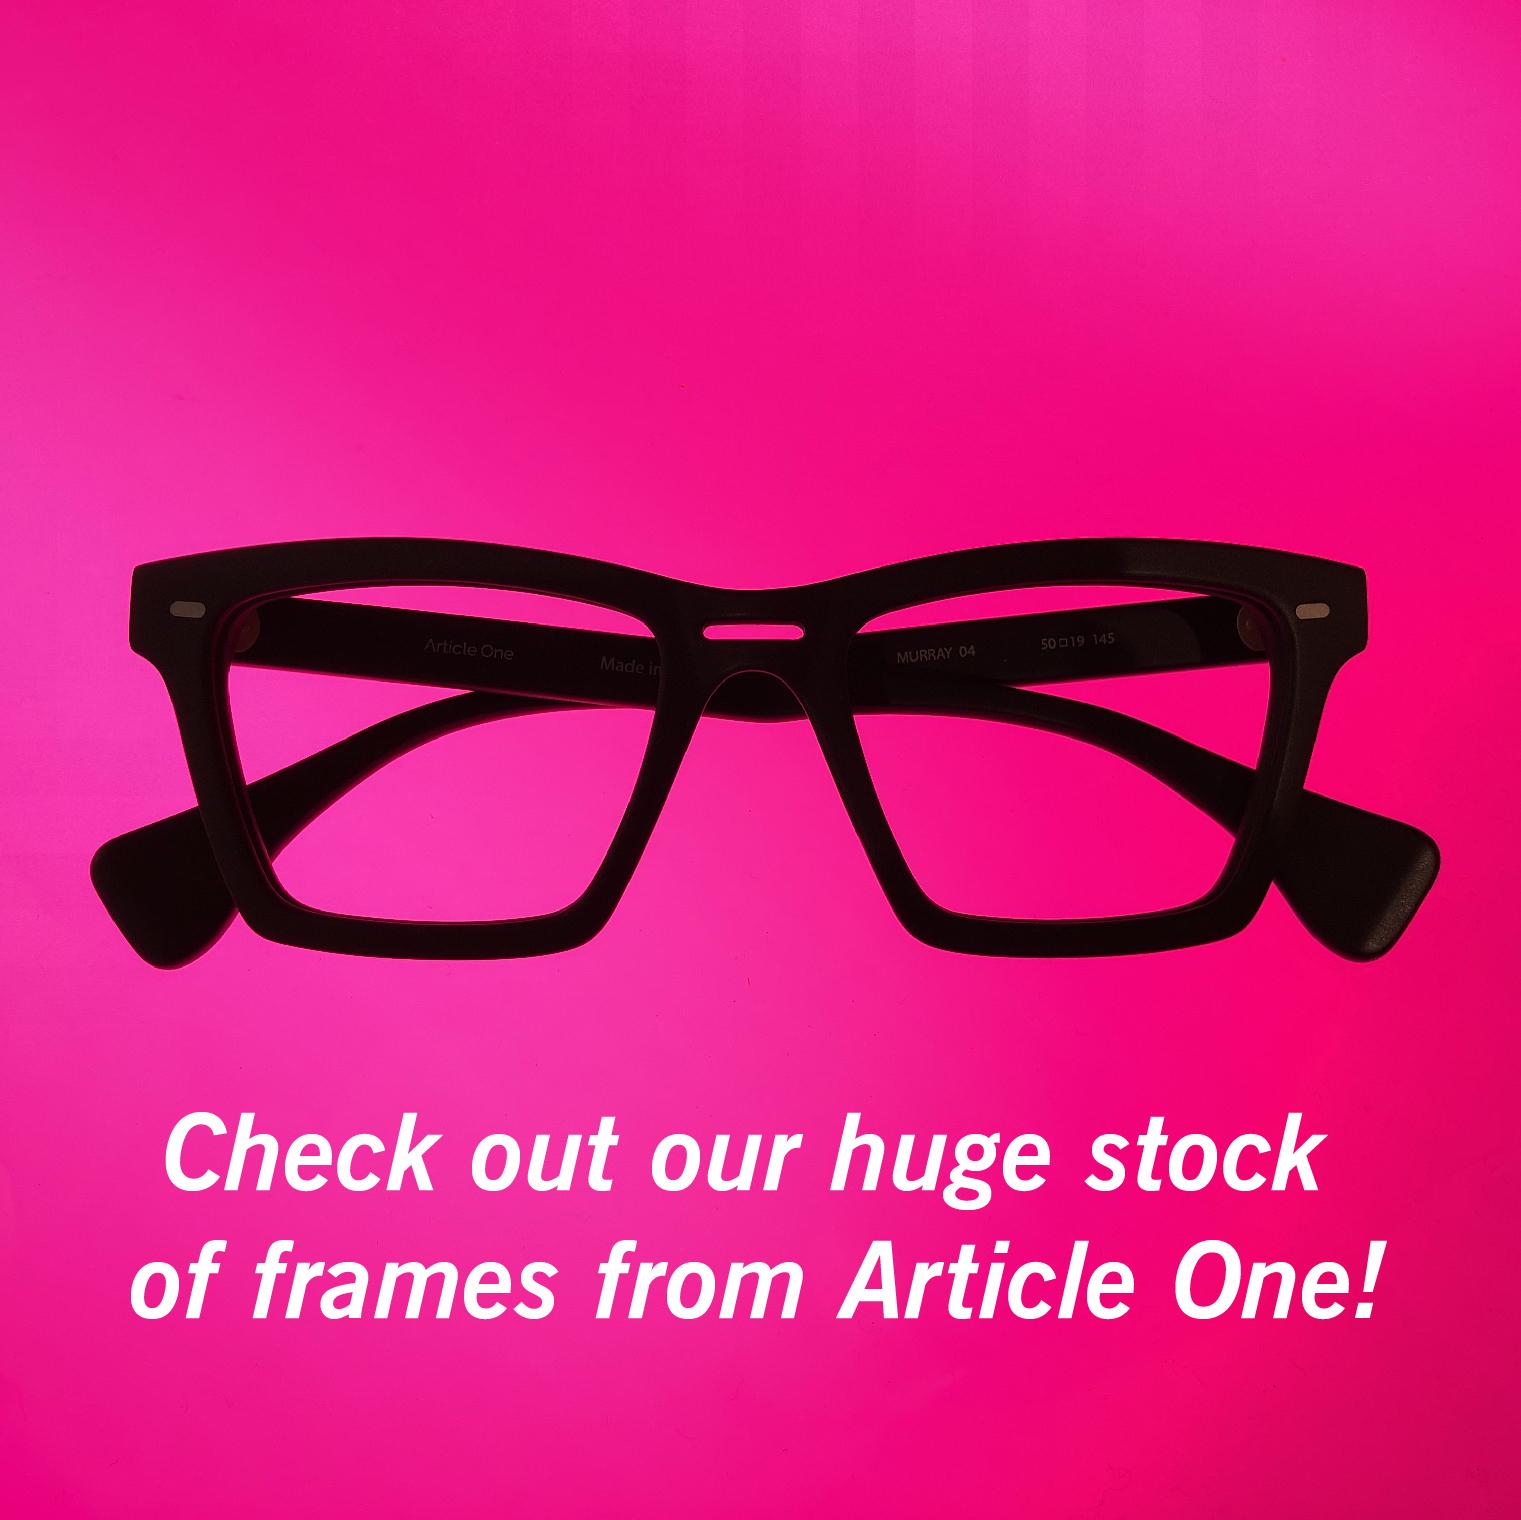 article-one-eyewear-same-day-eyeglasses-chicago-best-lenses.jpg